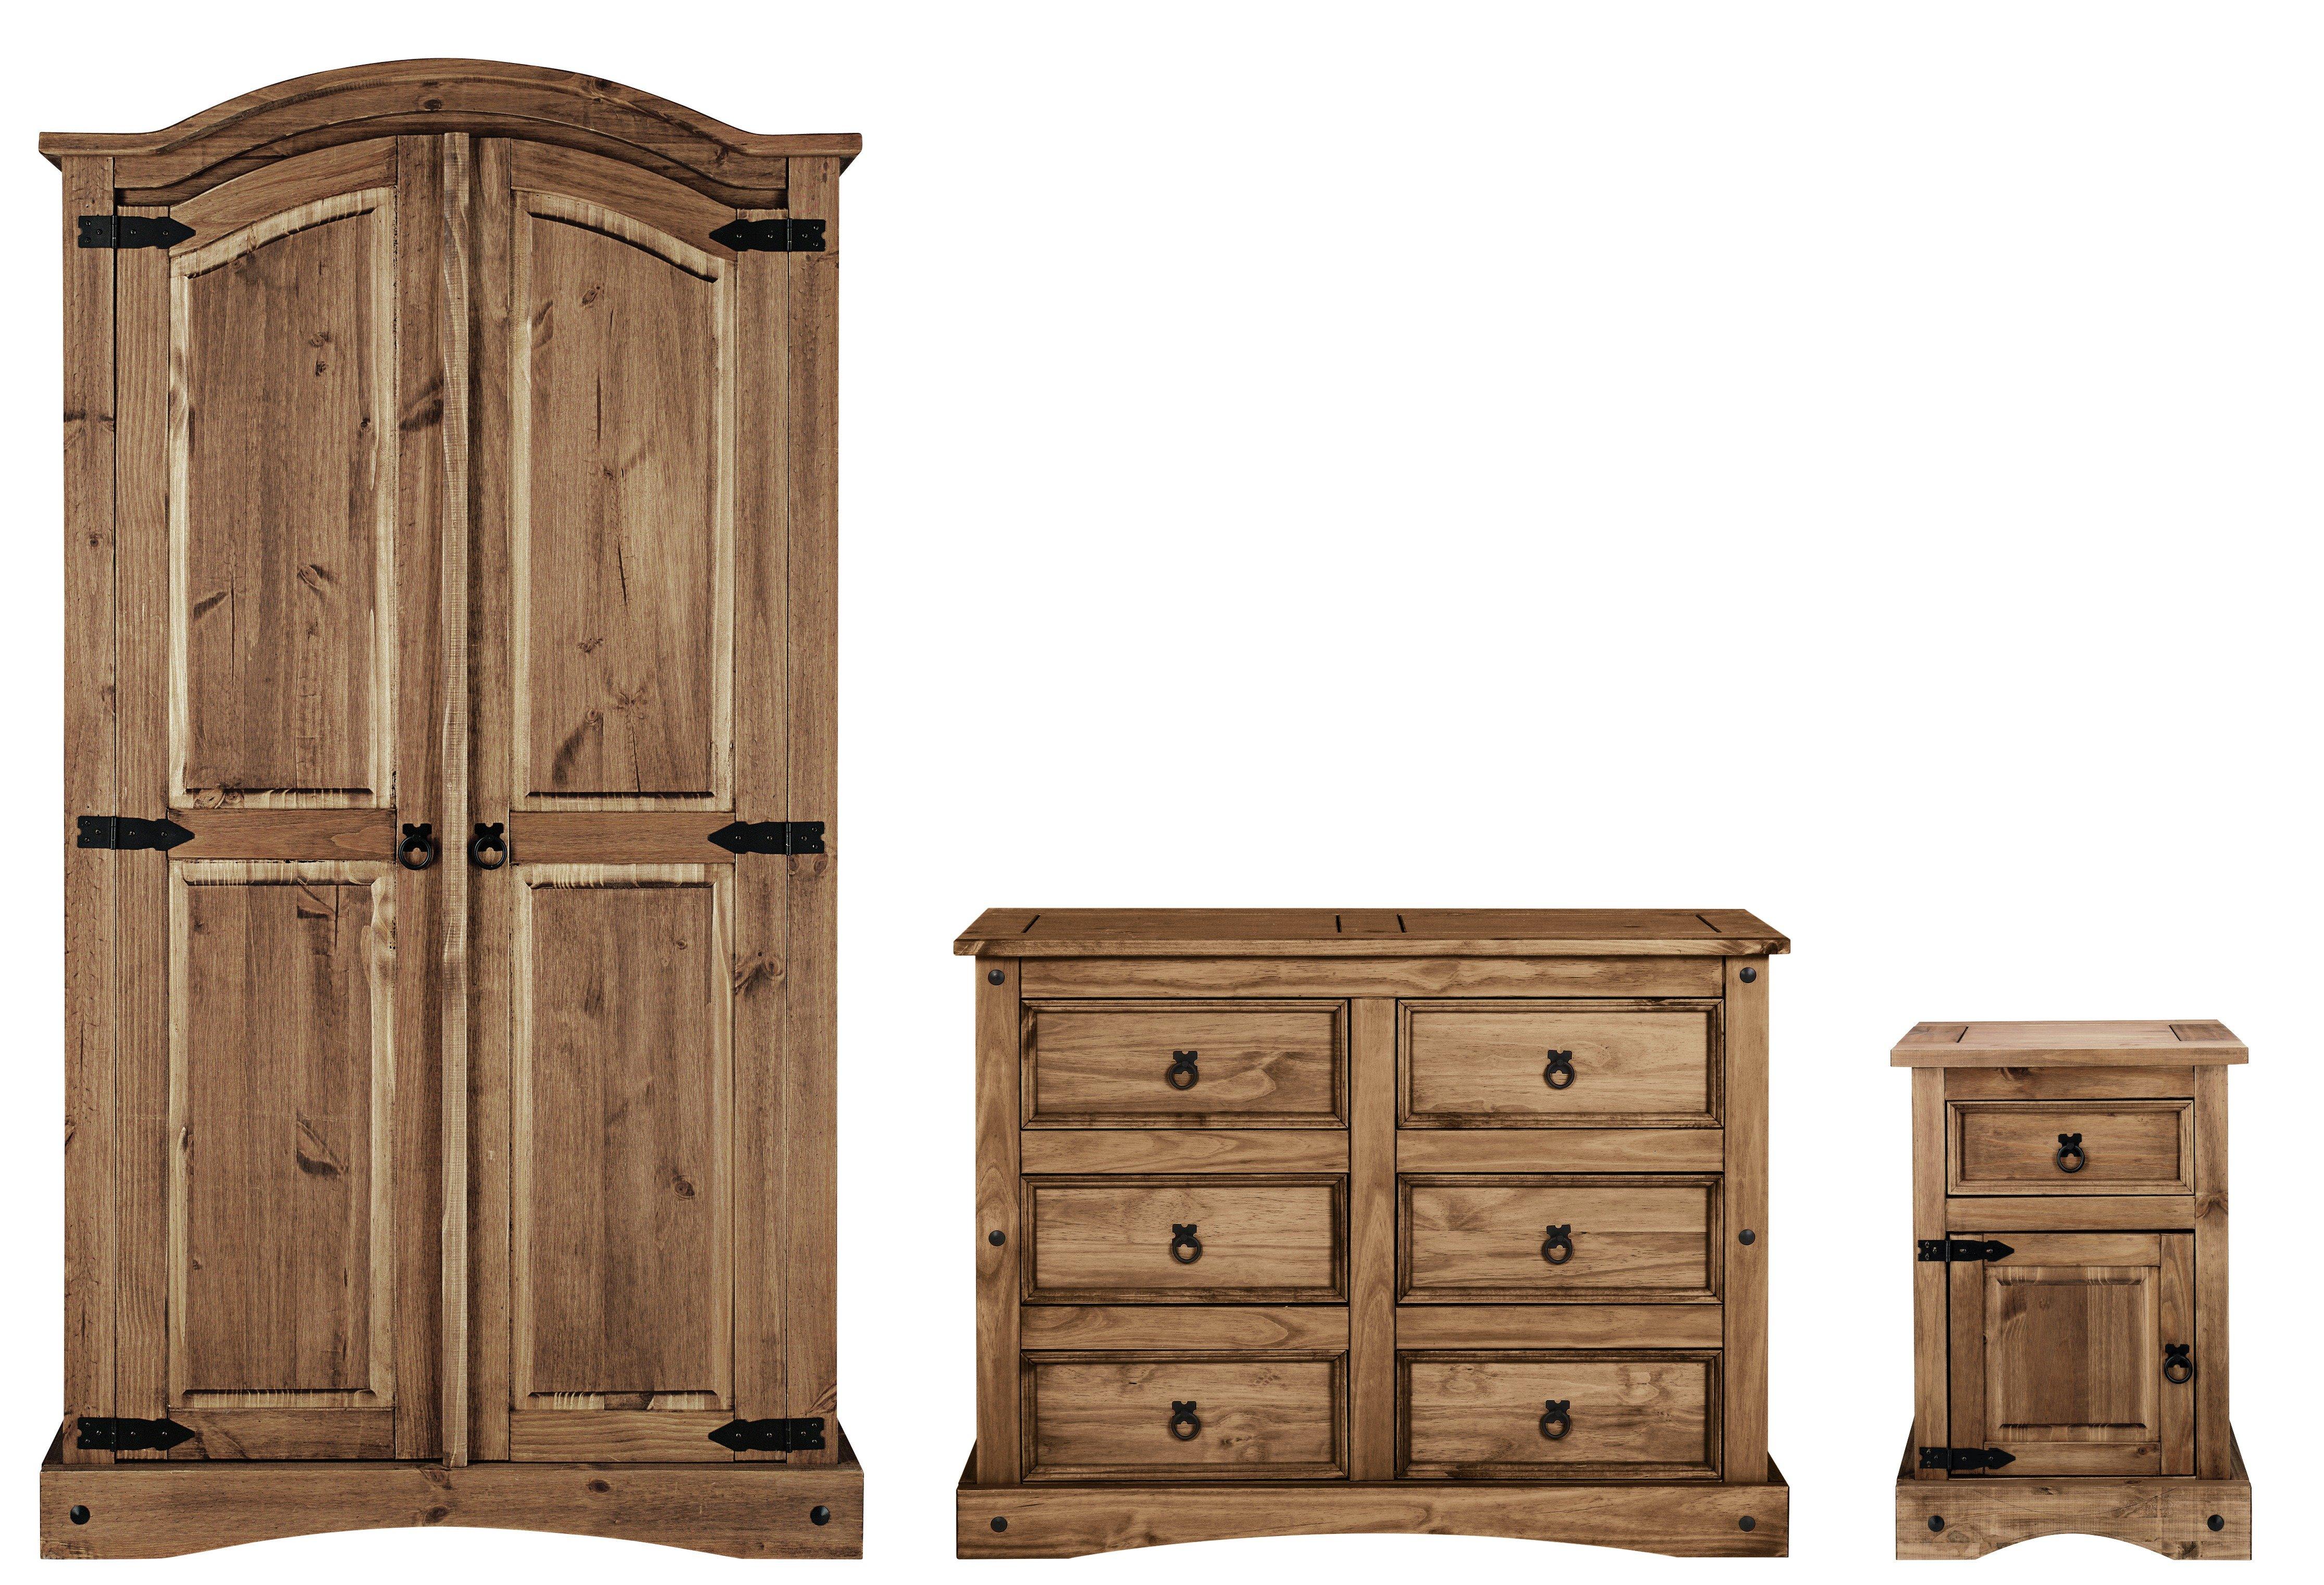 seconique flat packed corona pine bedroom furniture package. Black Bedroom Furniture Sets. Home Design Ideas